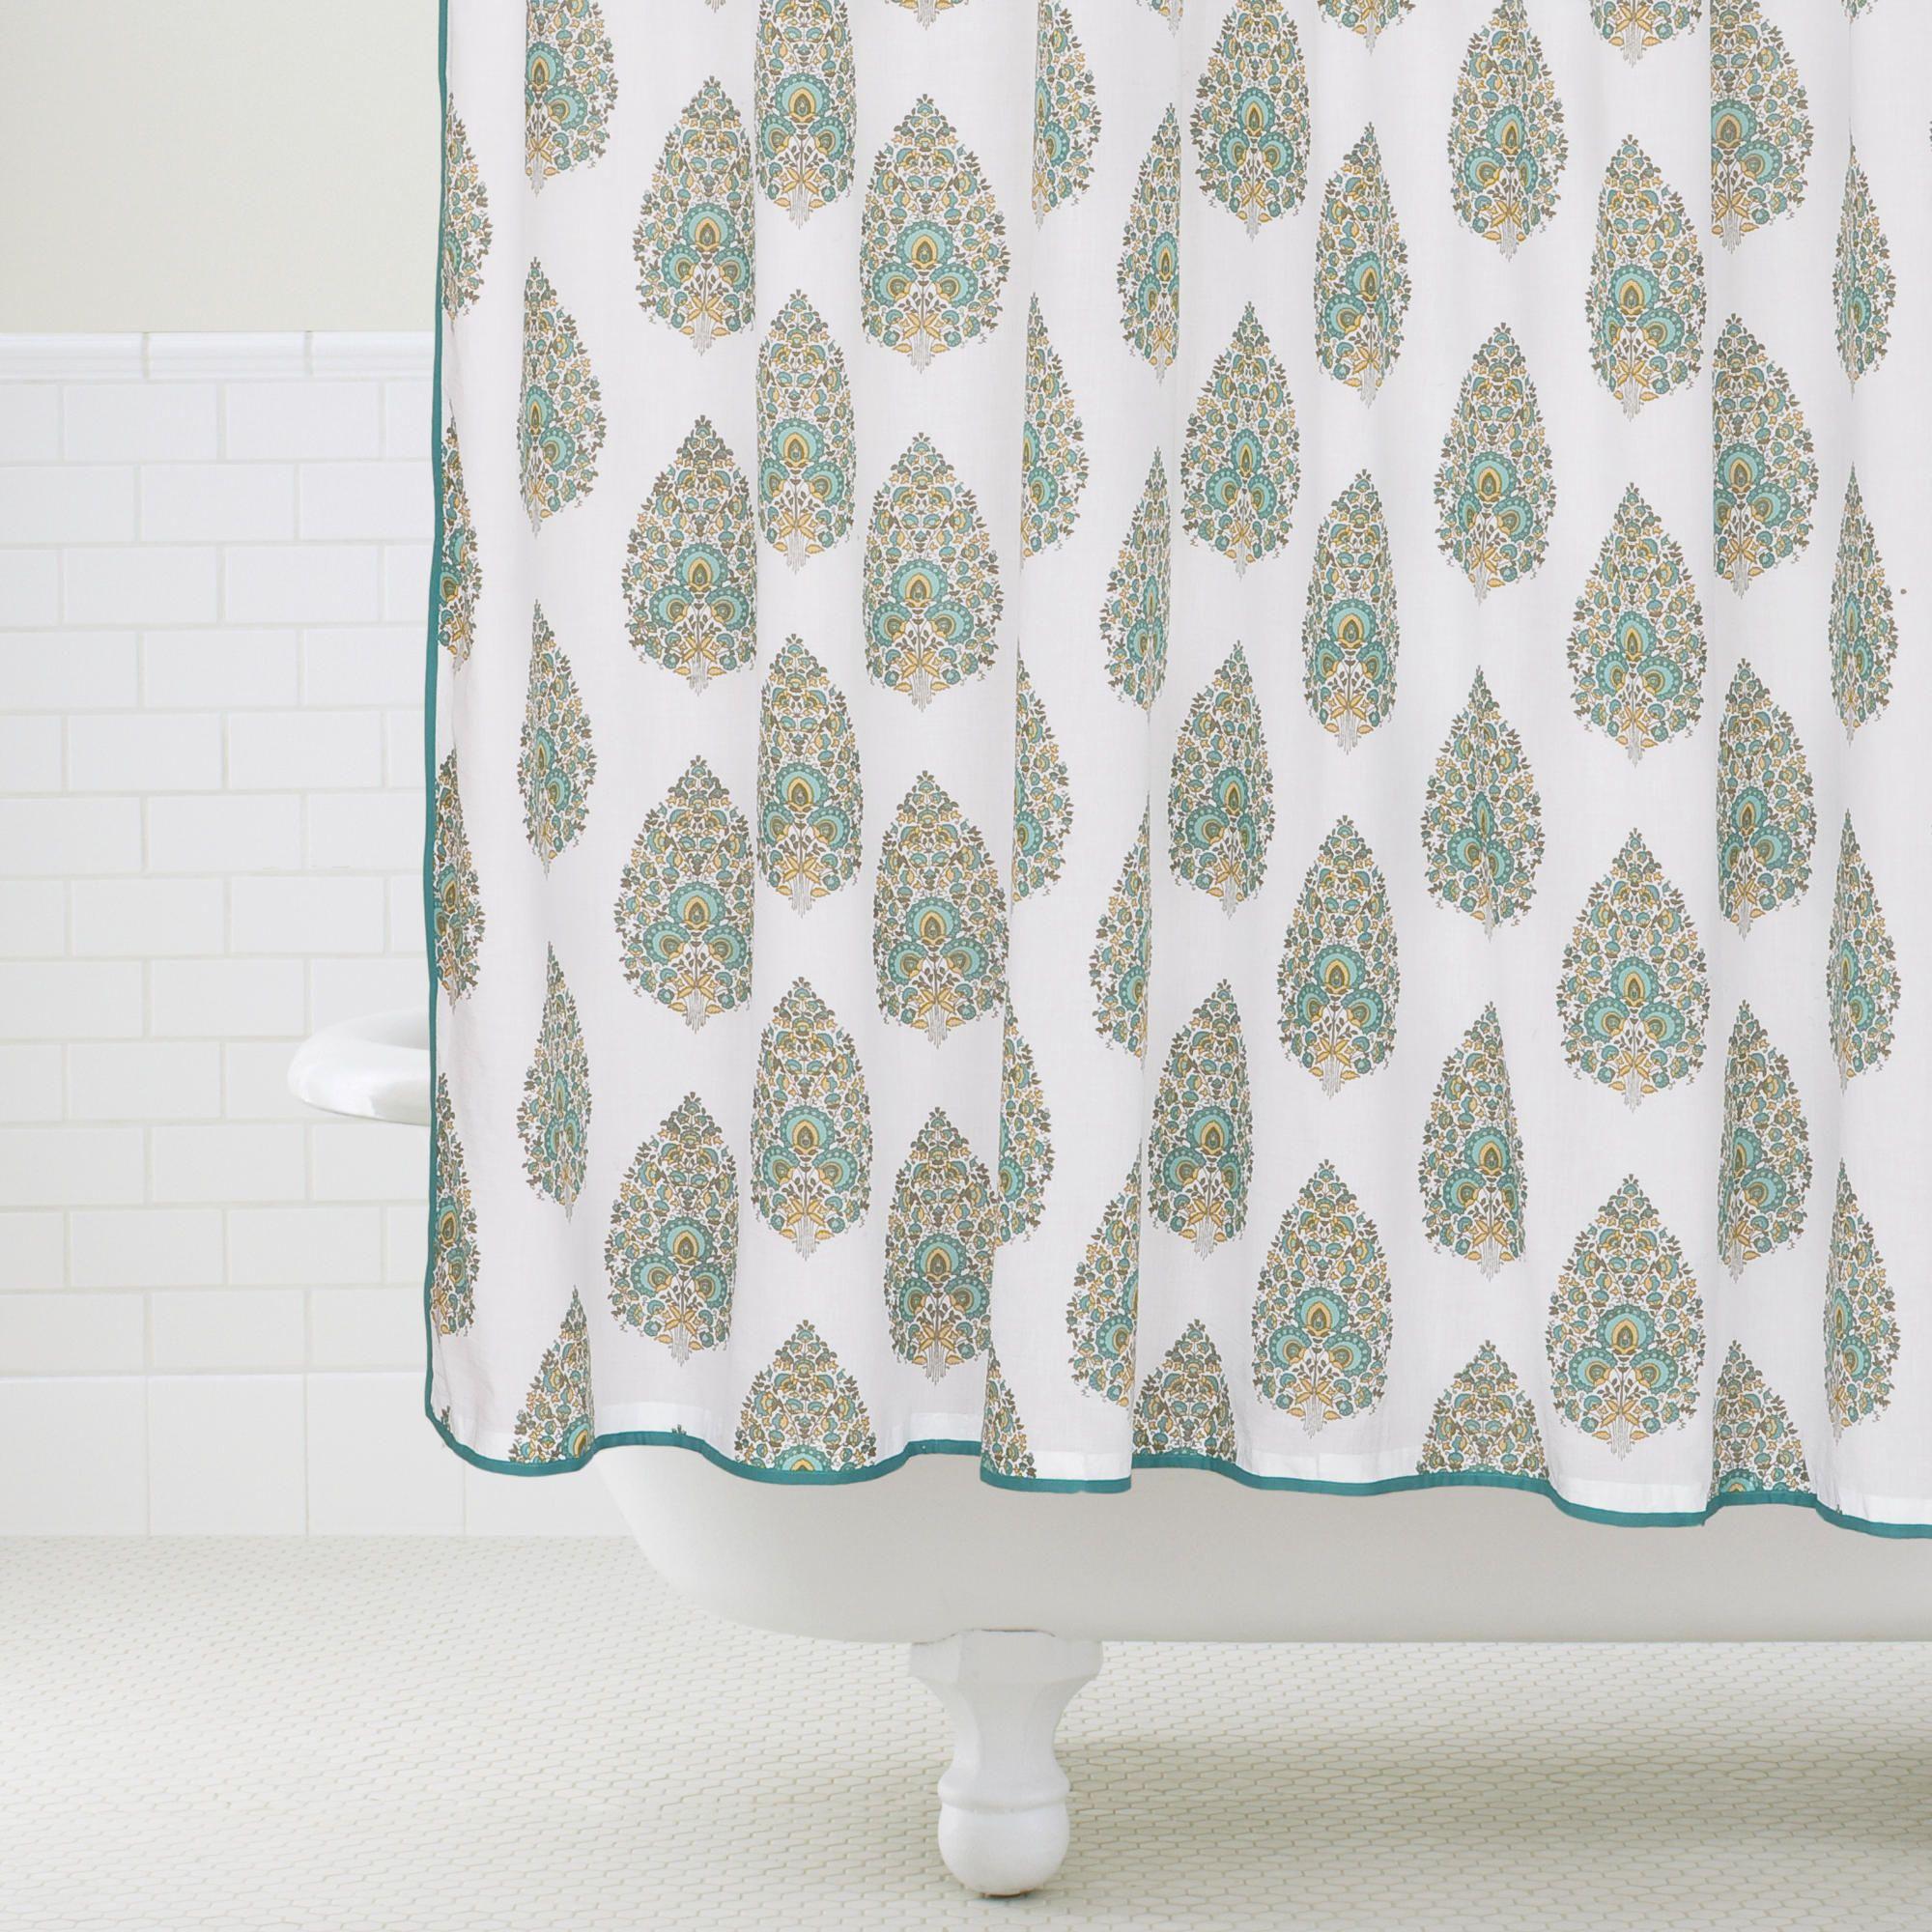 Peacock Bhuti Shower Curtain World Market 29 99 Home Decor